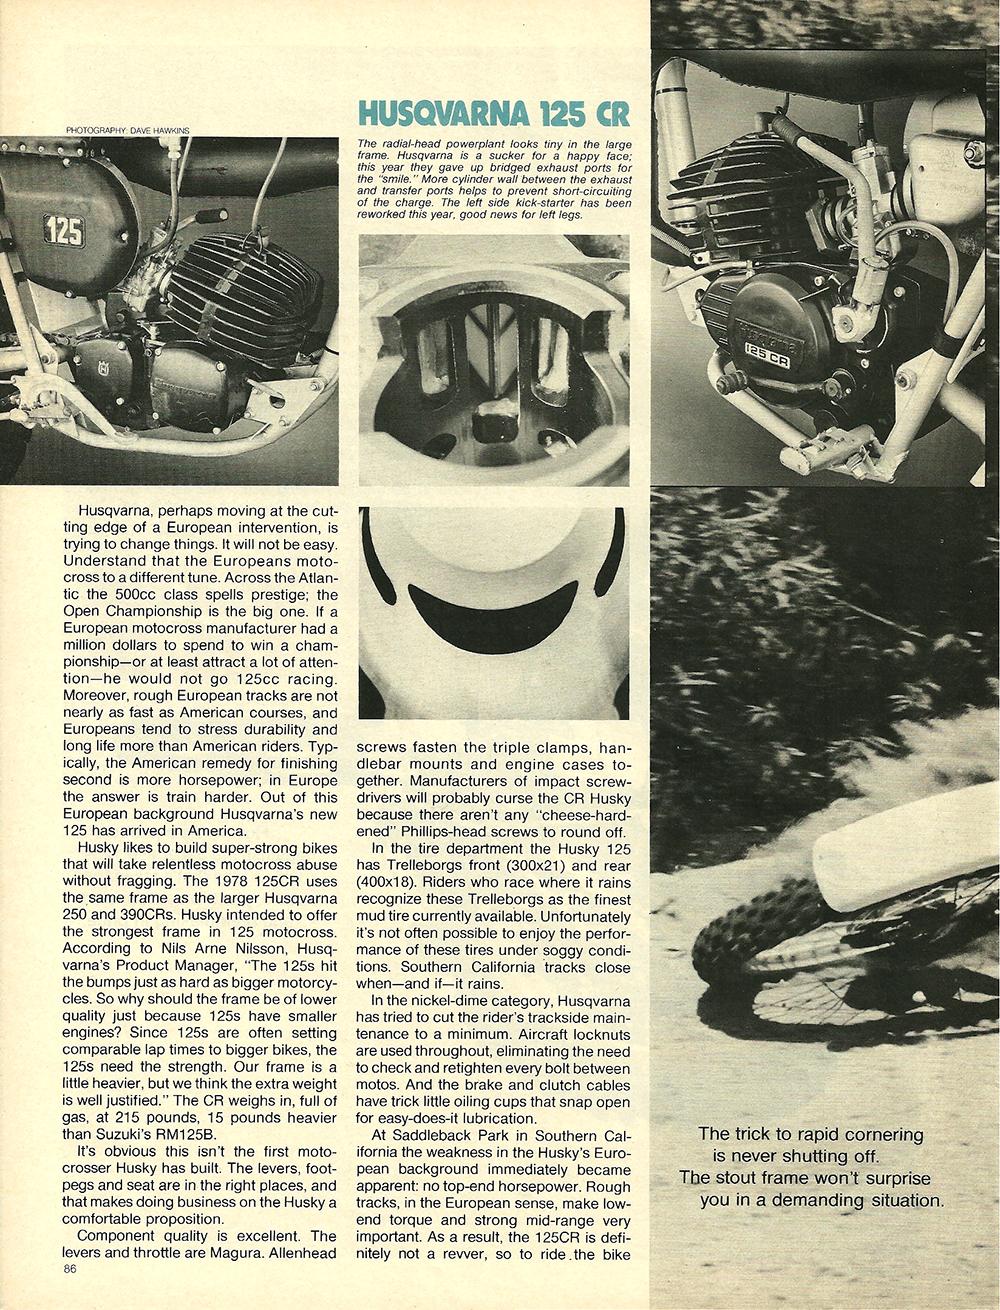 1977 Husqvarna 125 CR road test 2.jpg